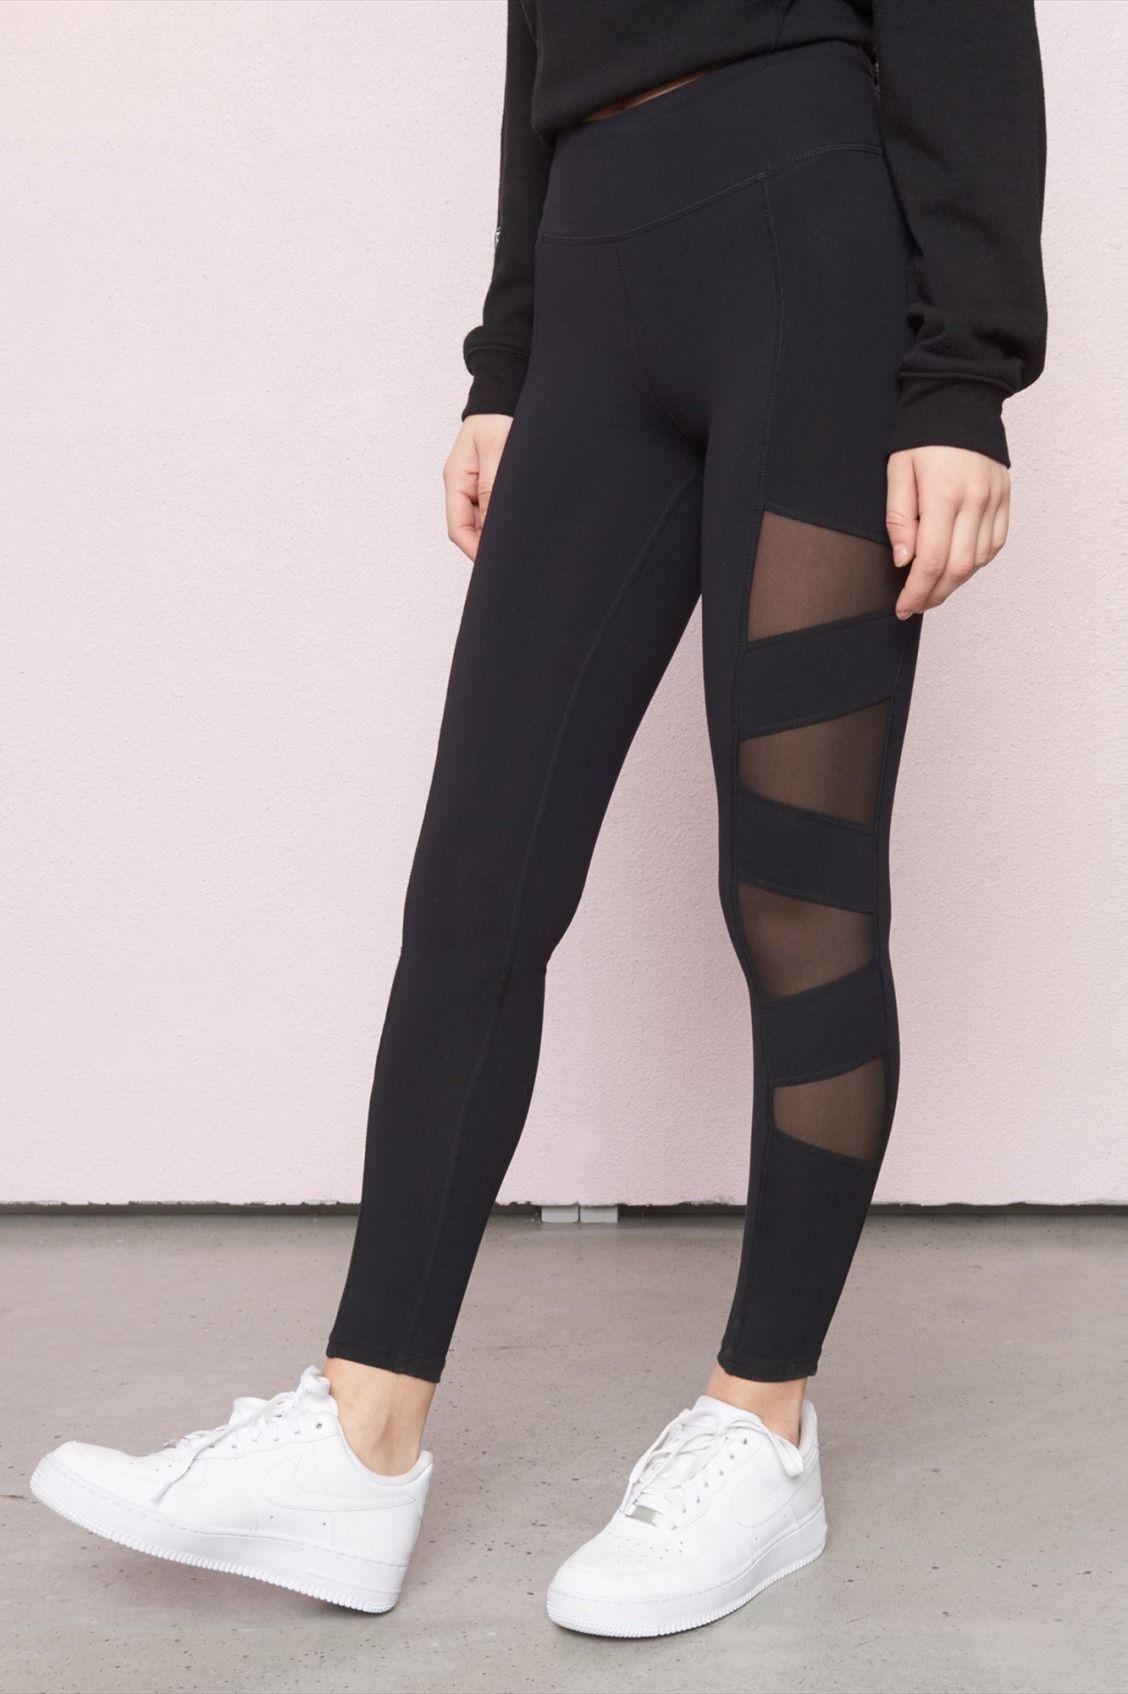 518401fda2e10 Online Shopping Ladies Dress | Woodward Clothing | Mesh leggings ...